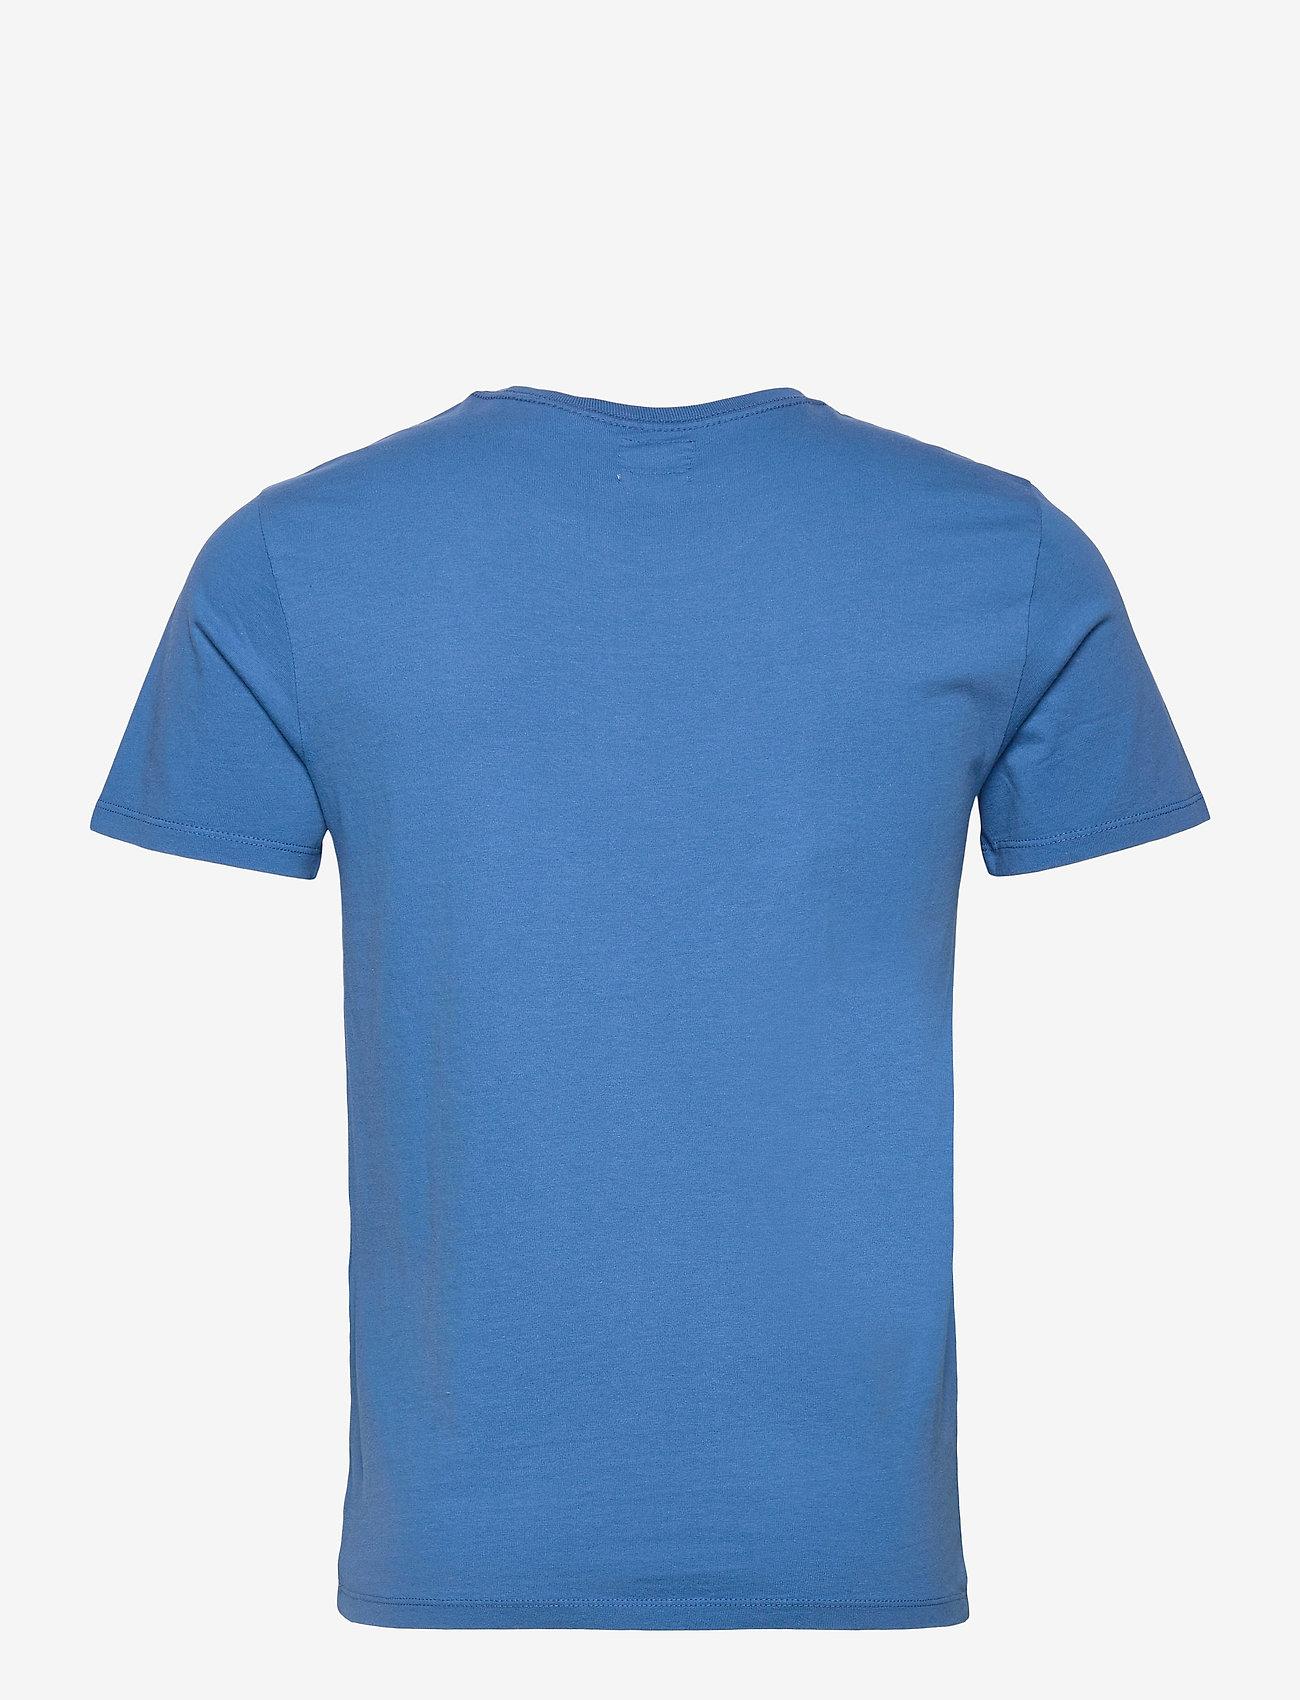 LEVI´S Men - SS ORIGINAL HM TEE STAR SAPPHI - podstawowe koszulki - blues - 1